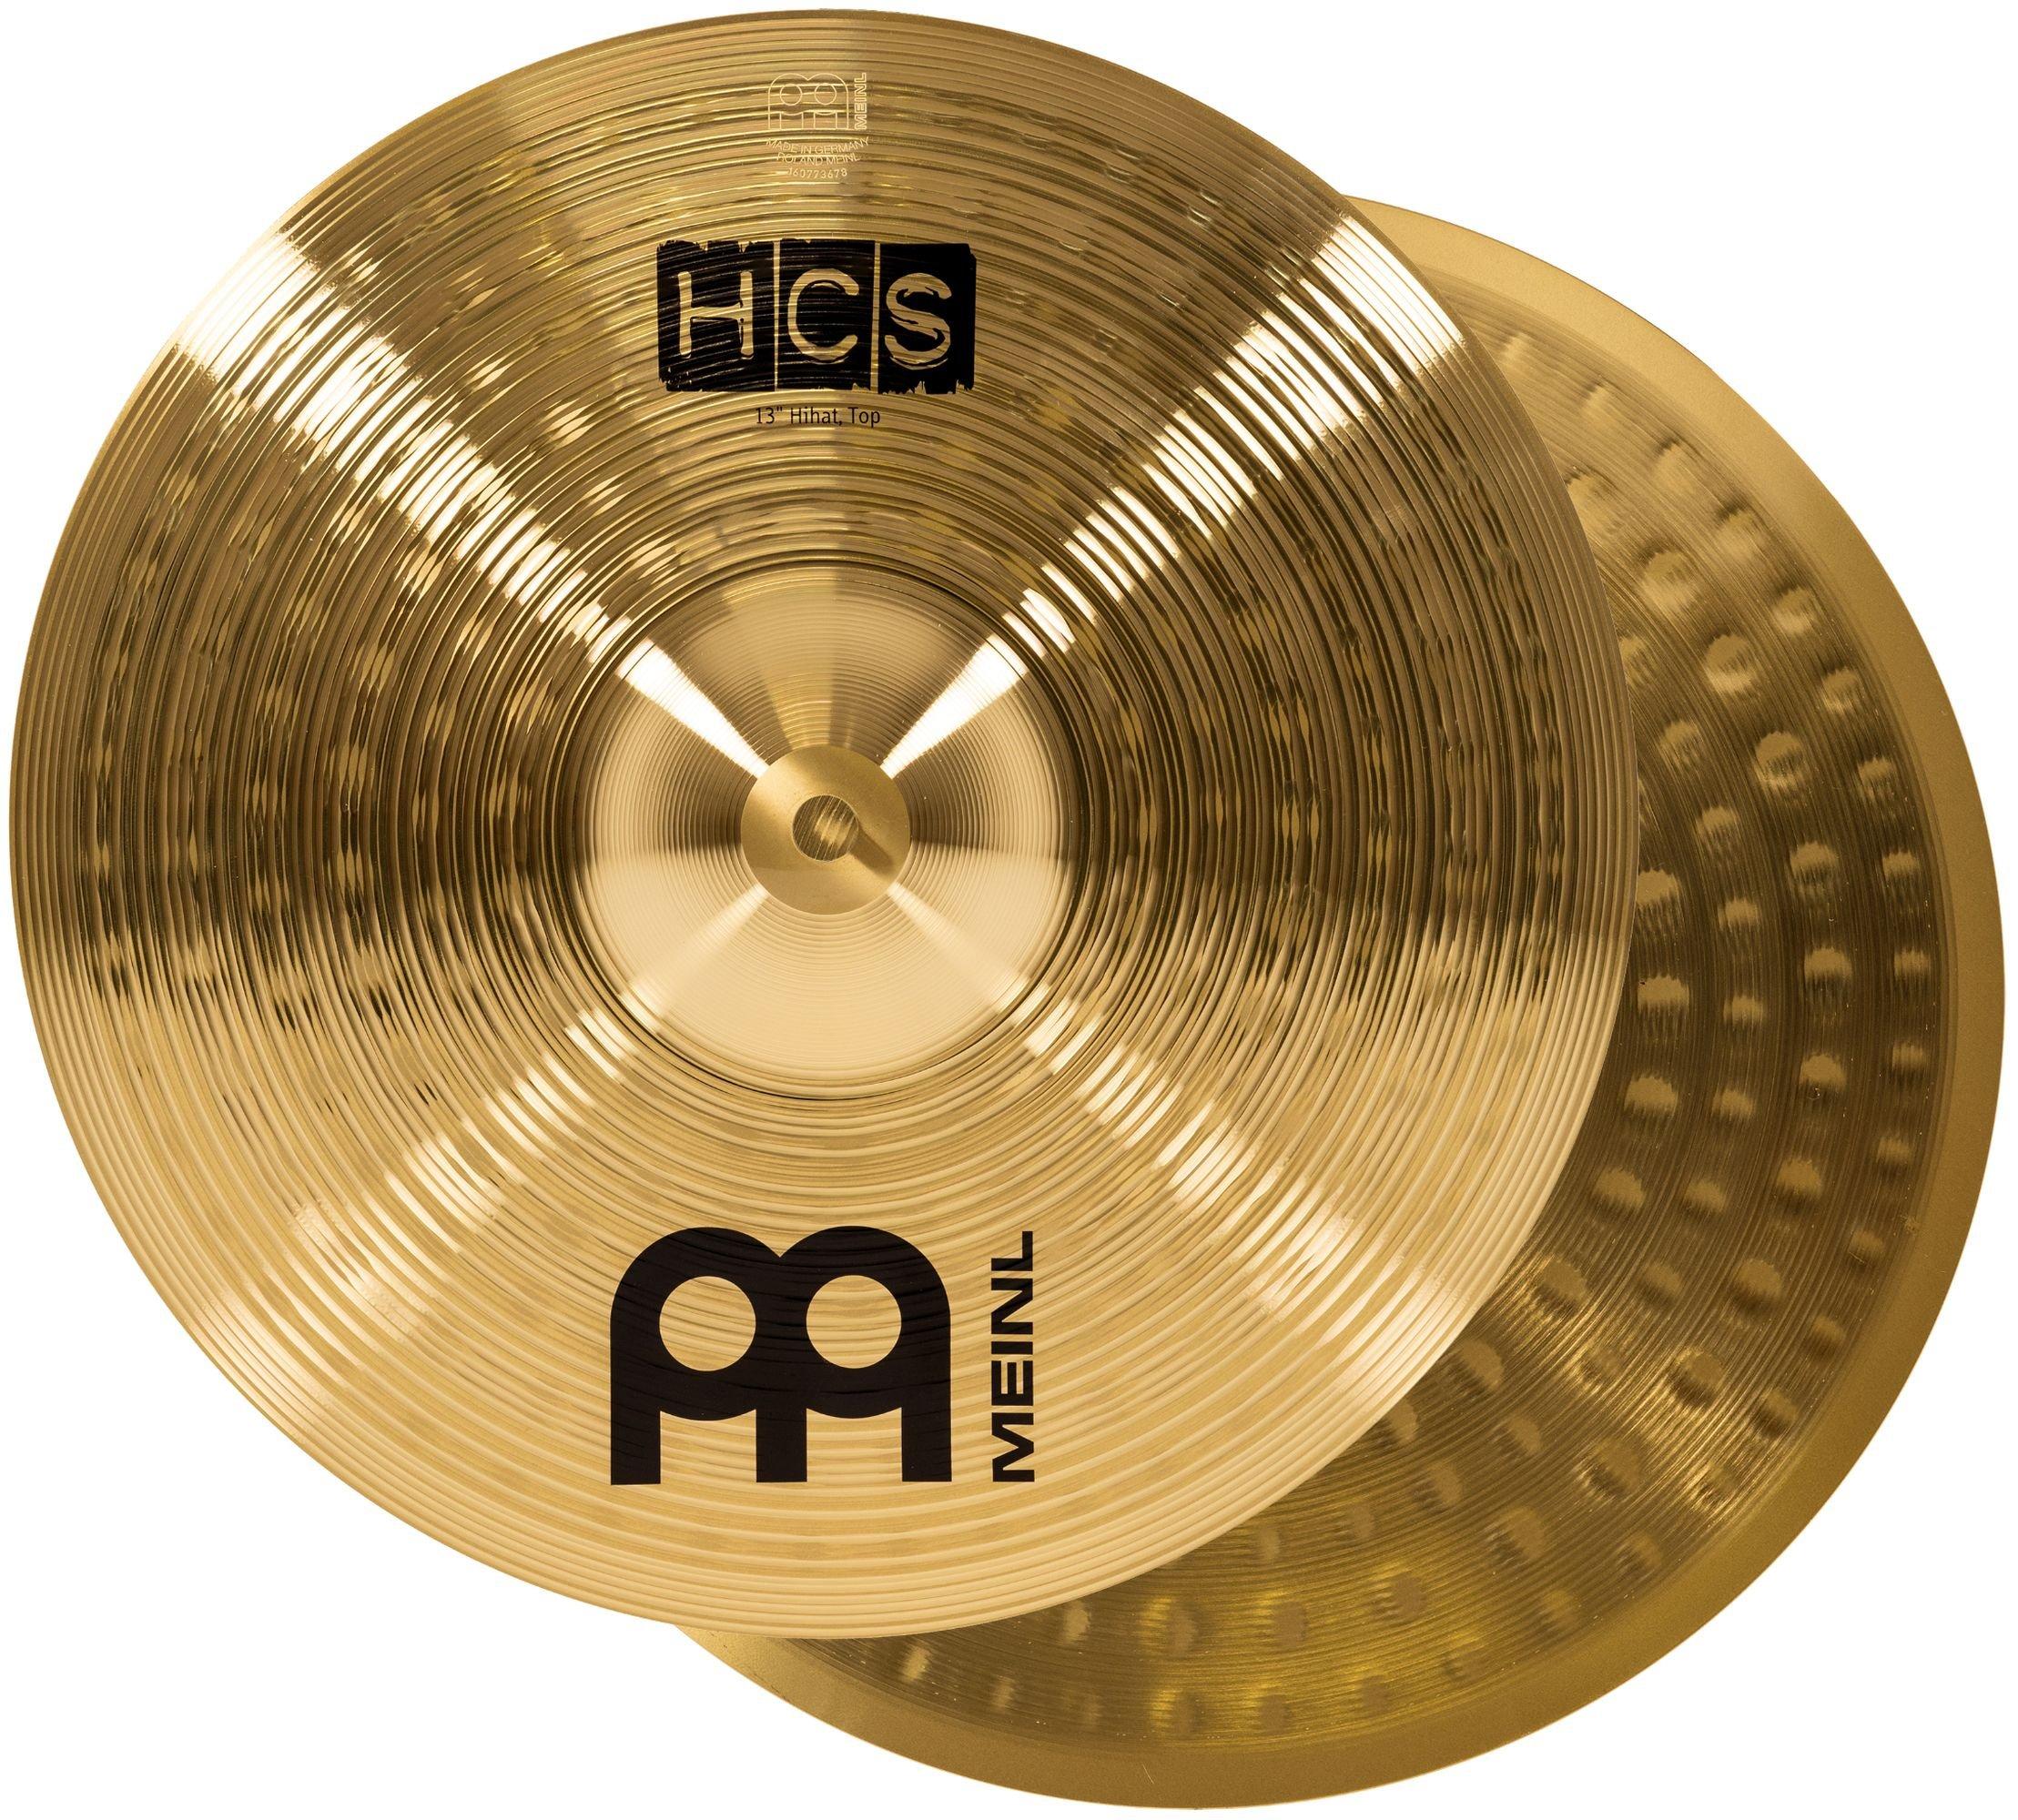 Meinl Cymbals HCS13H 13'' HCS Brass Hihat (Hi hat) Cymbals for Drum Set, Pair (VIDEO)